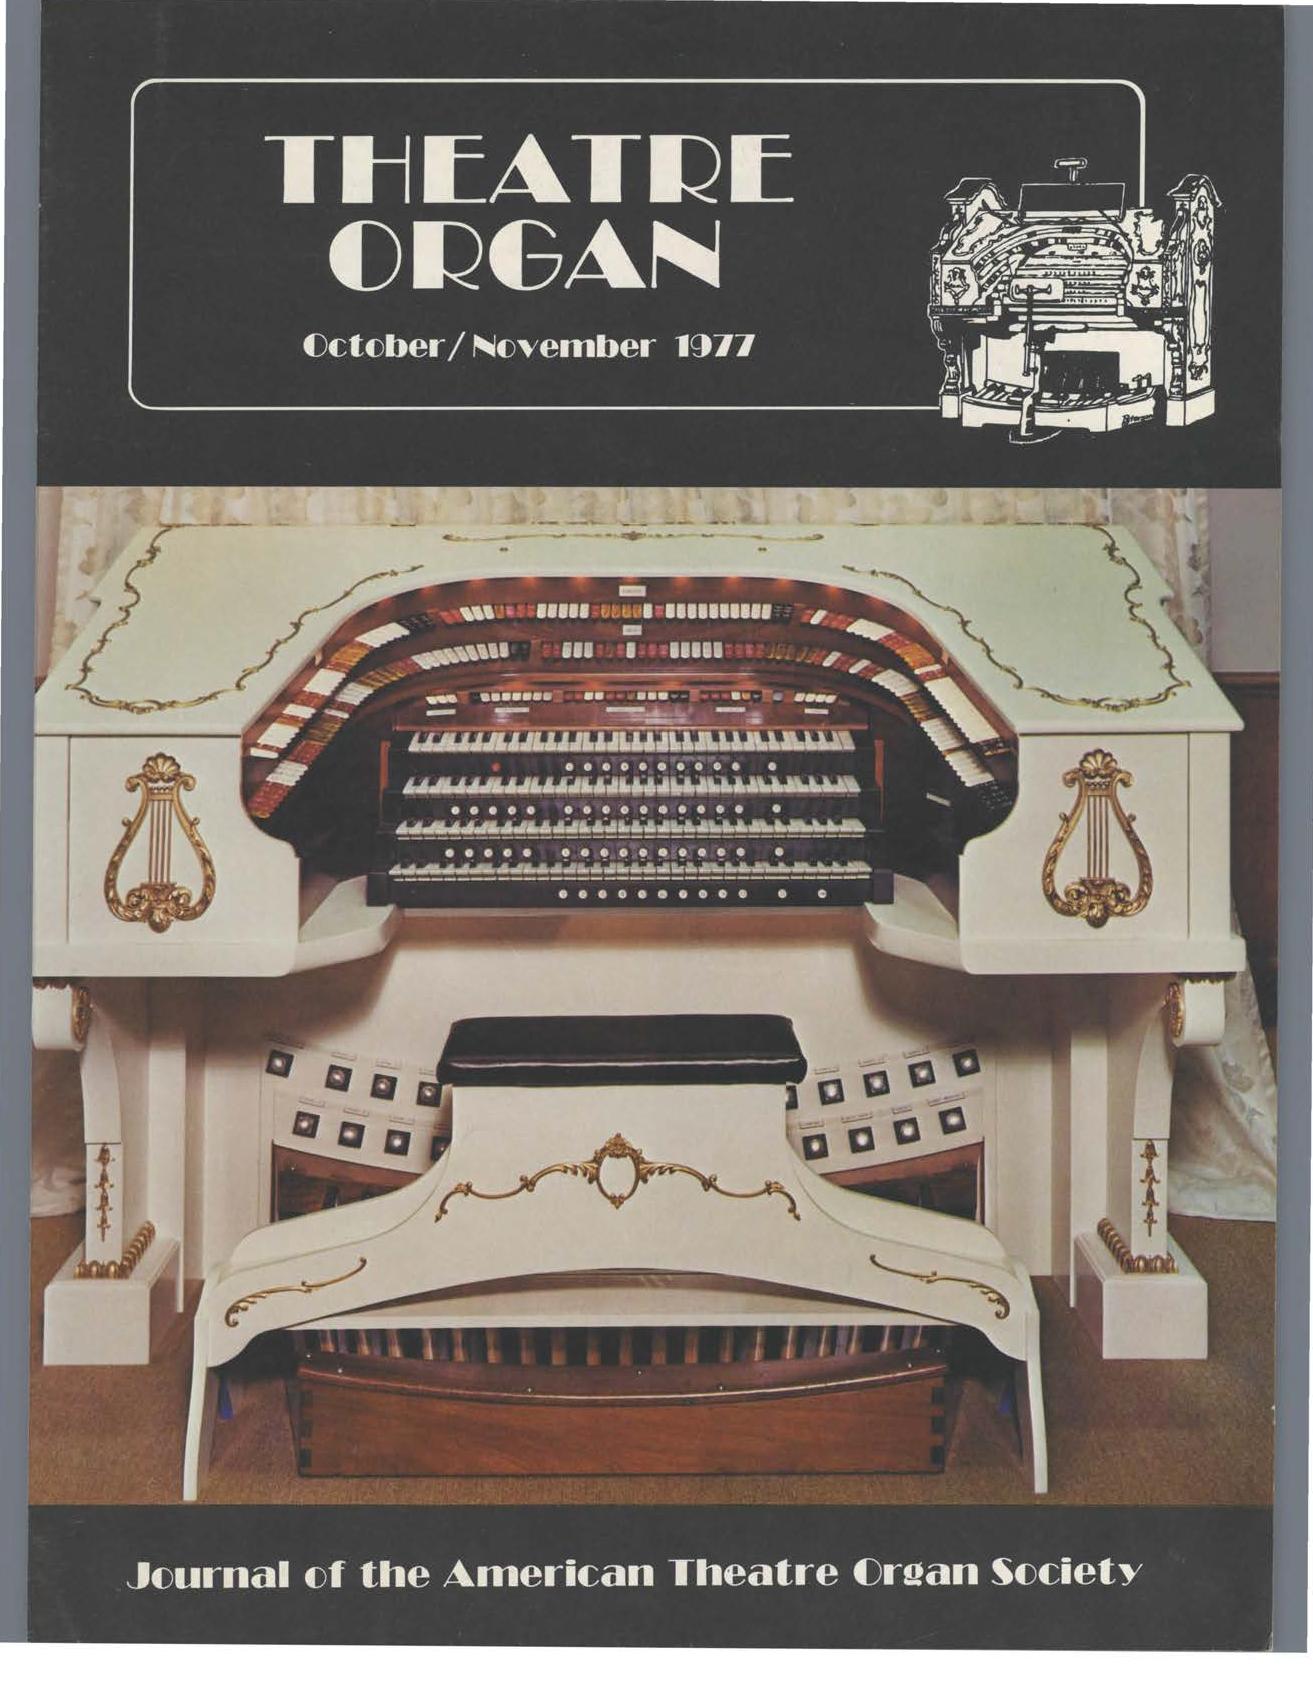 Theatre Organ, October - November 1977, Volume 19, Number 5